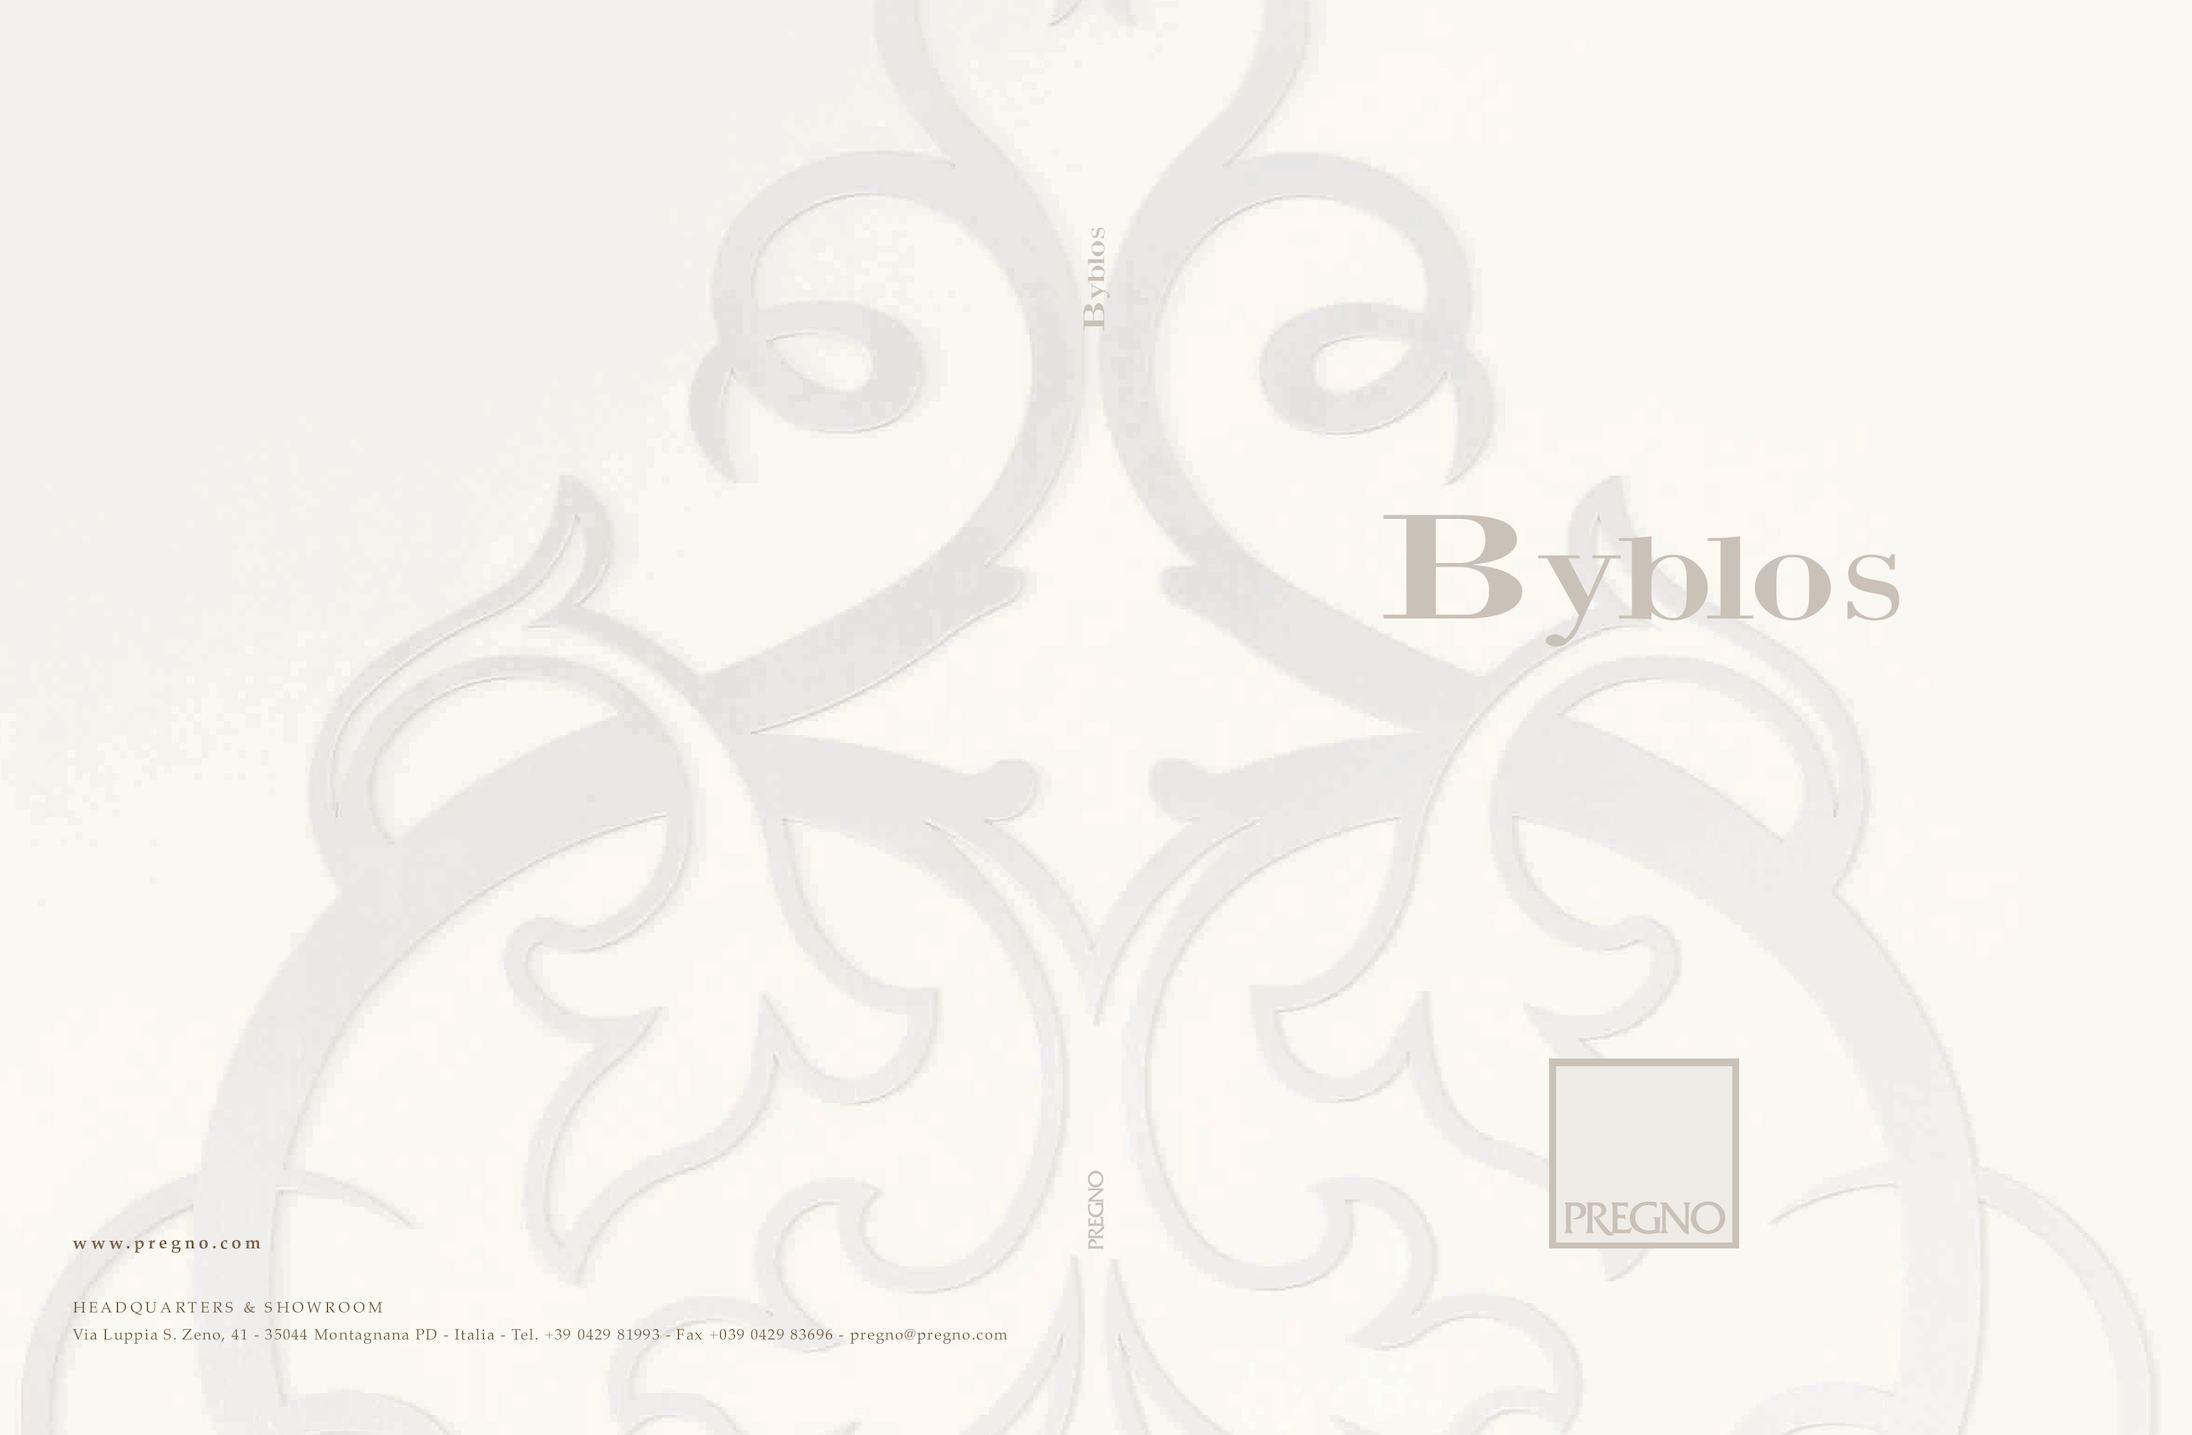 Calaméo catalogo byblos